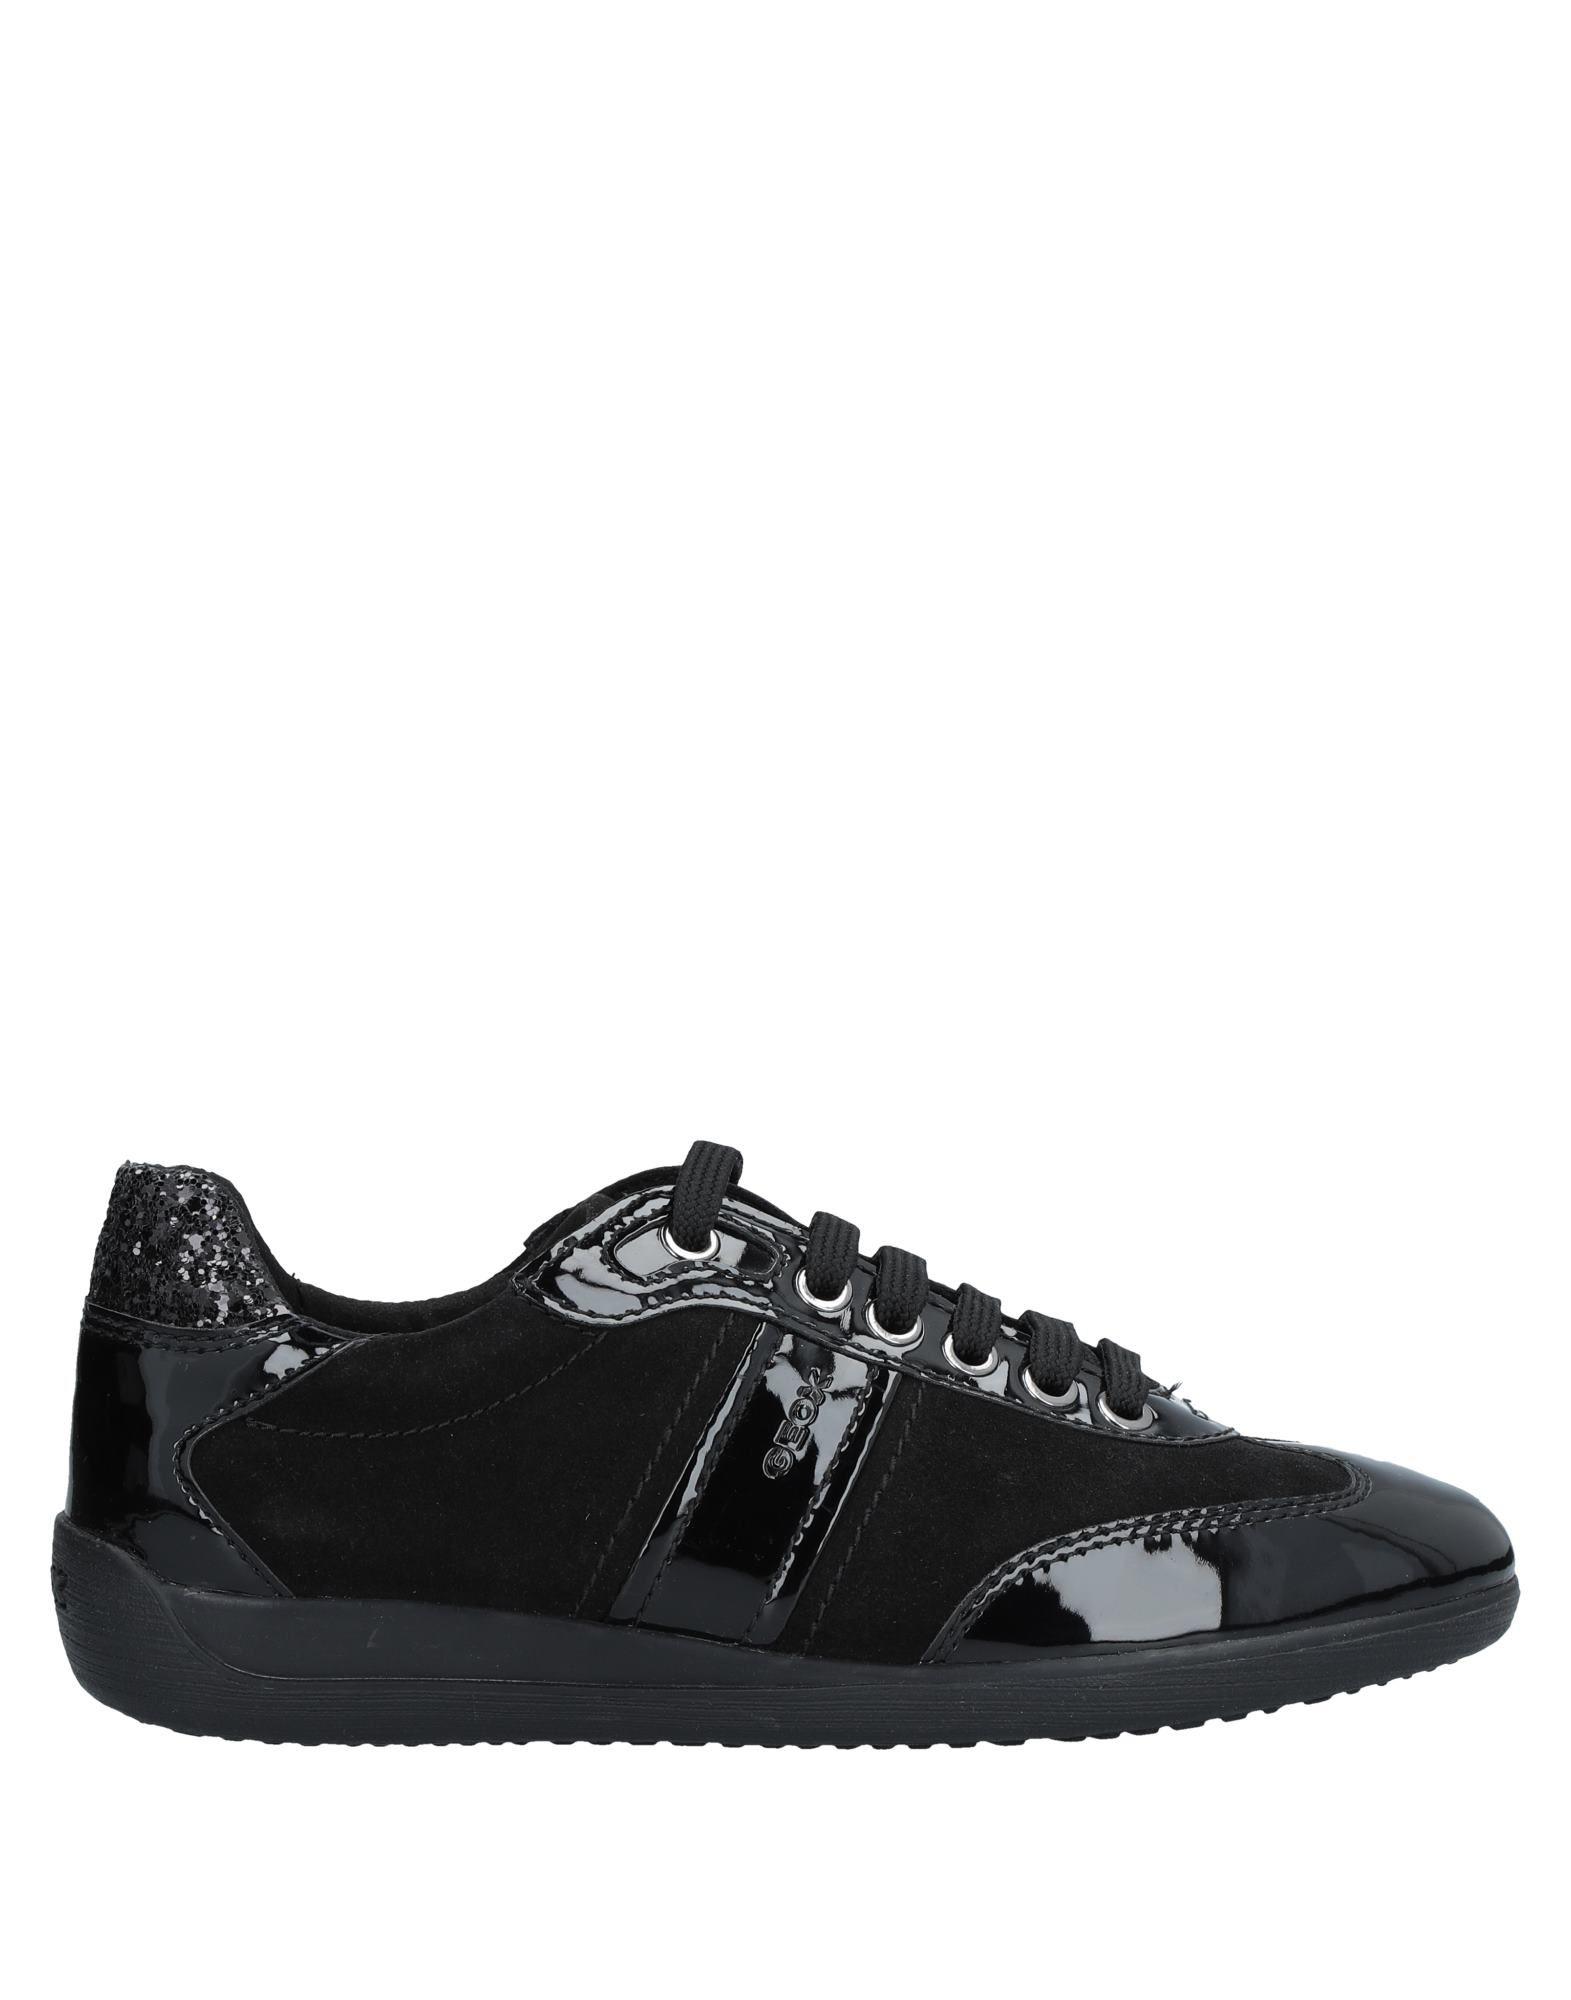 Geox Sneakers Damen  11540440WX Gute Qualität beliebte Schuhe